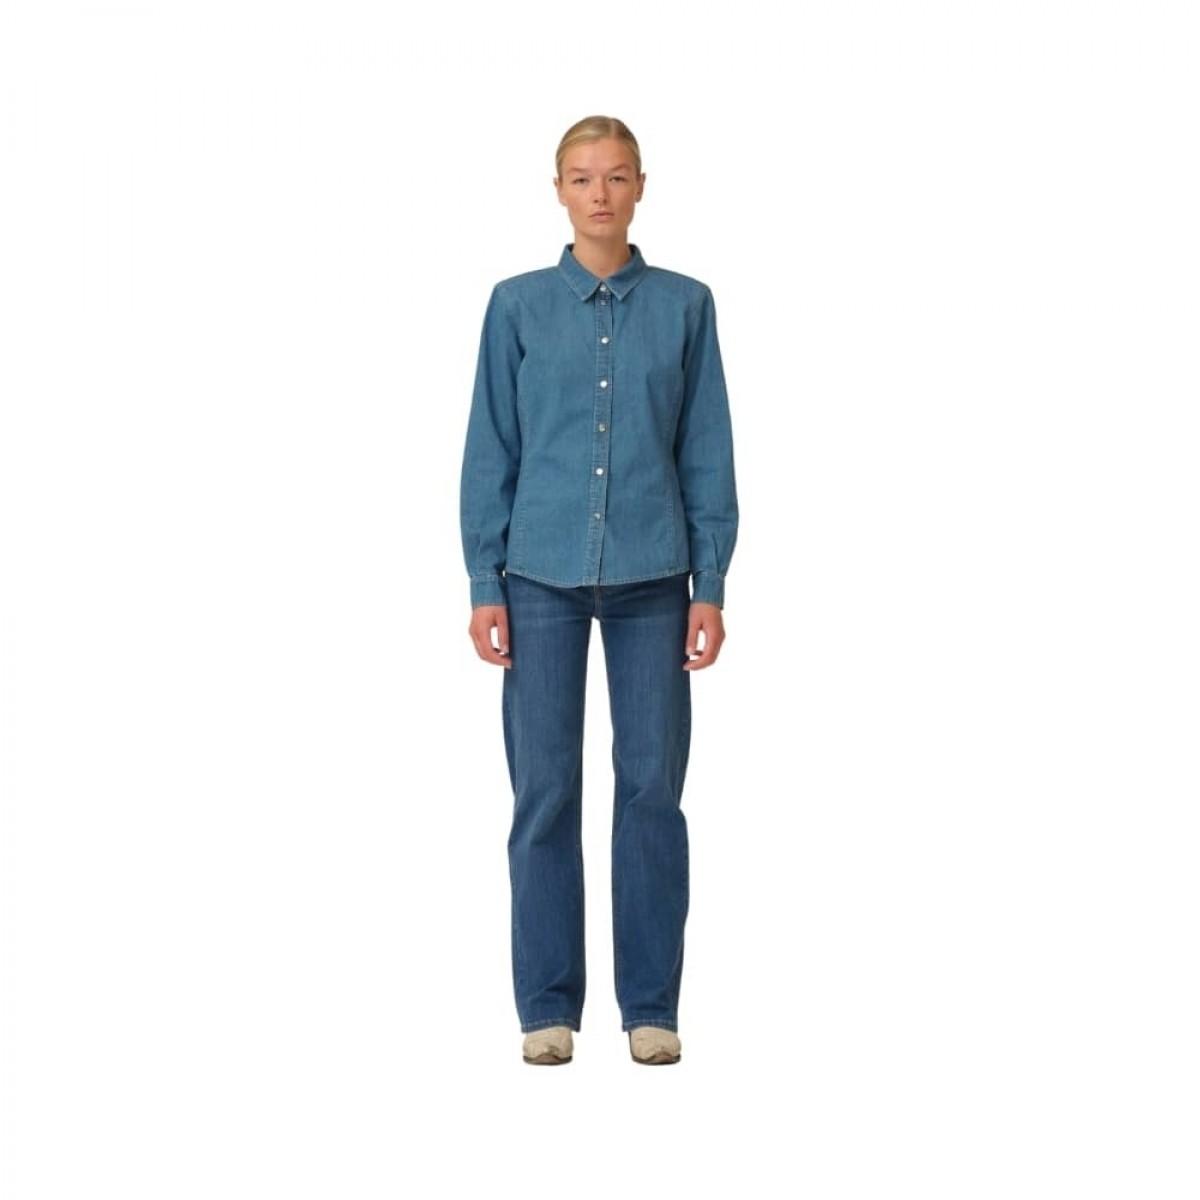 brown straight jeans - denim blue